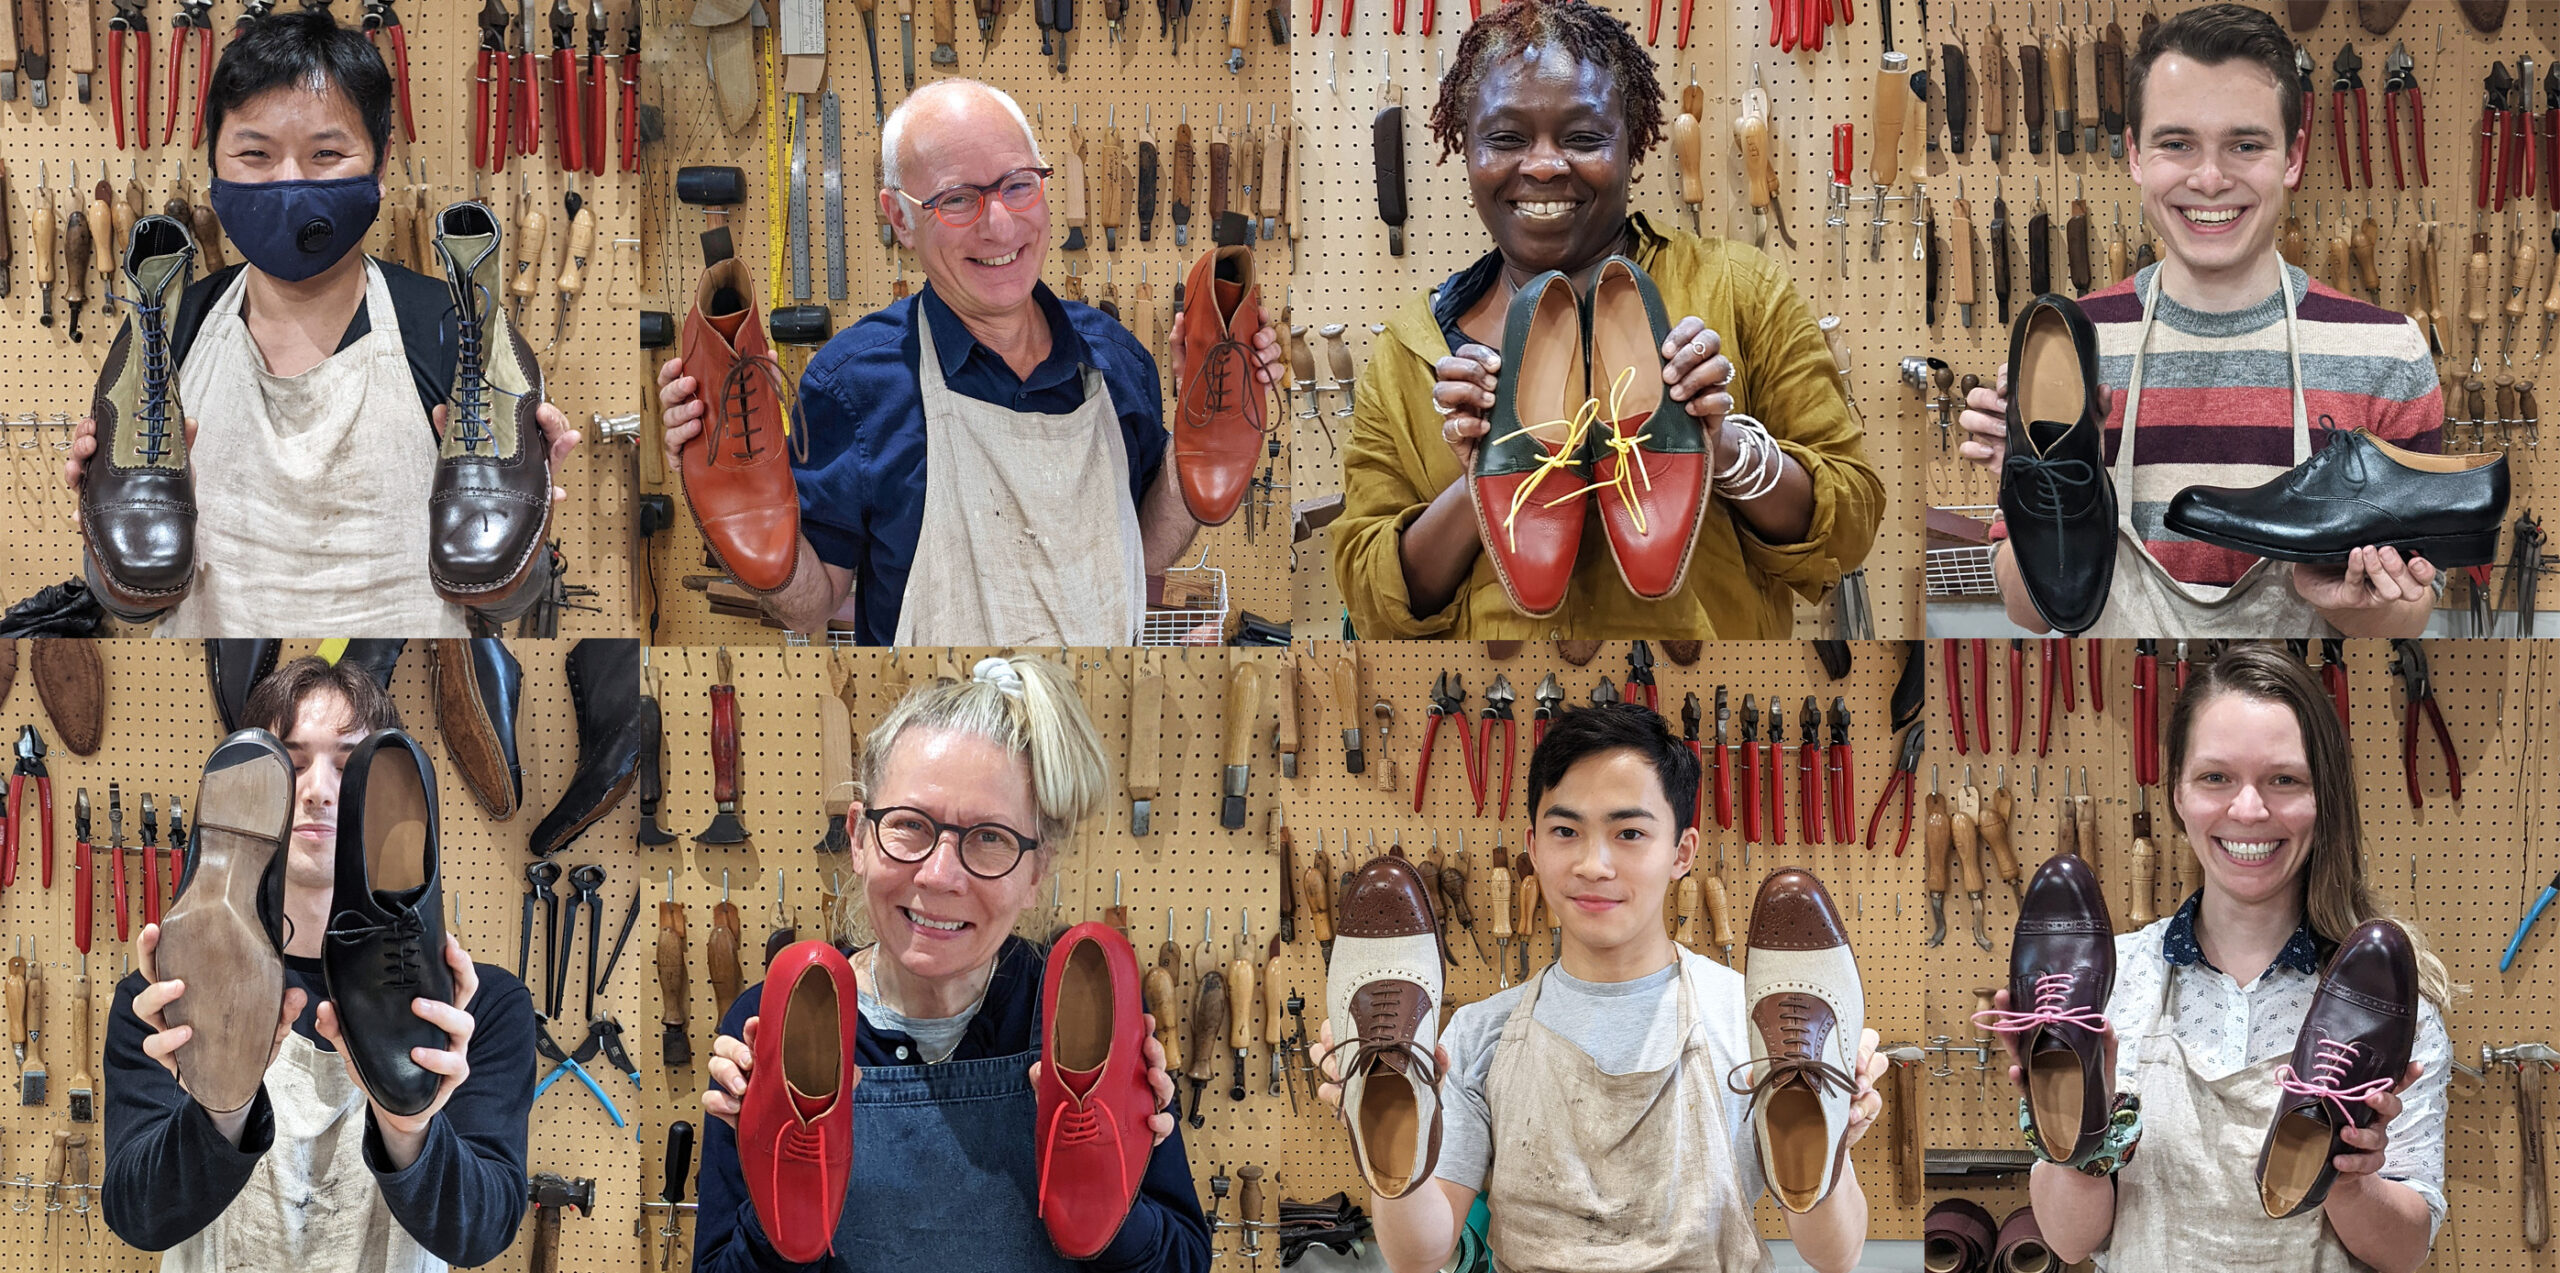 Carreducker shoe making students